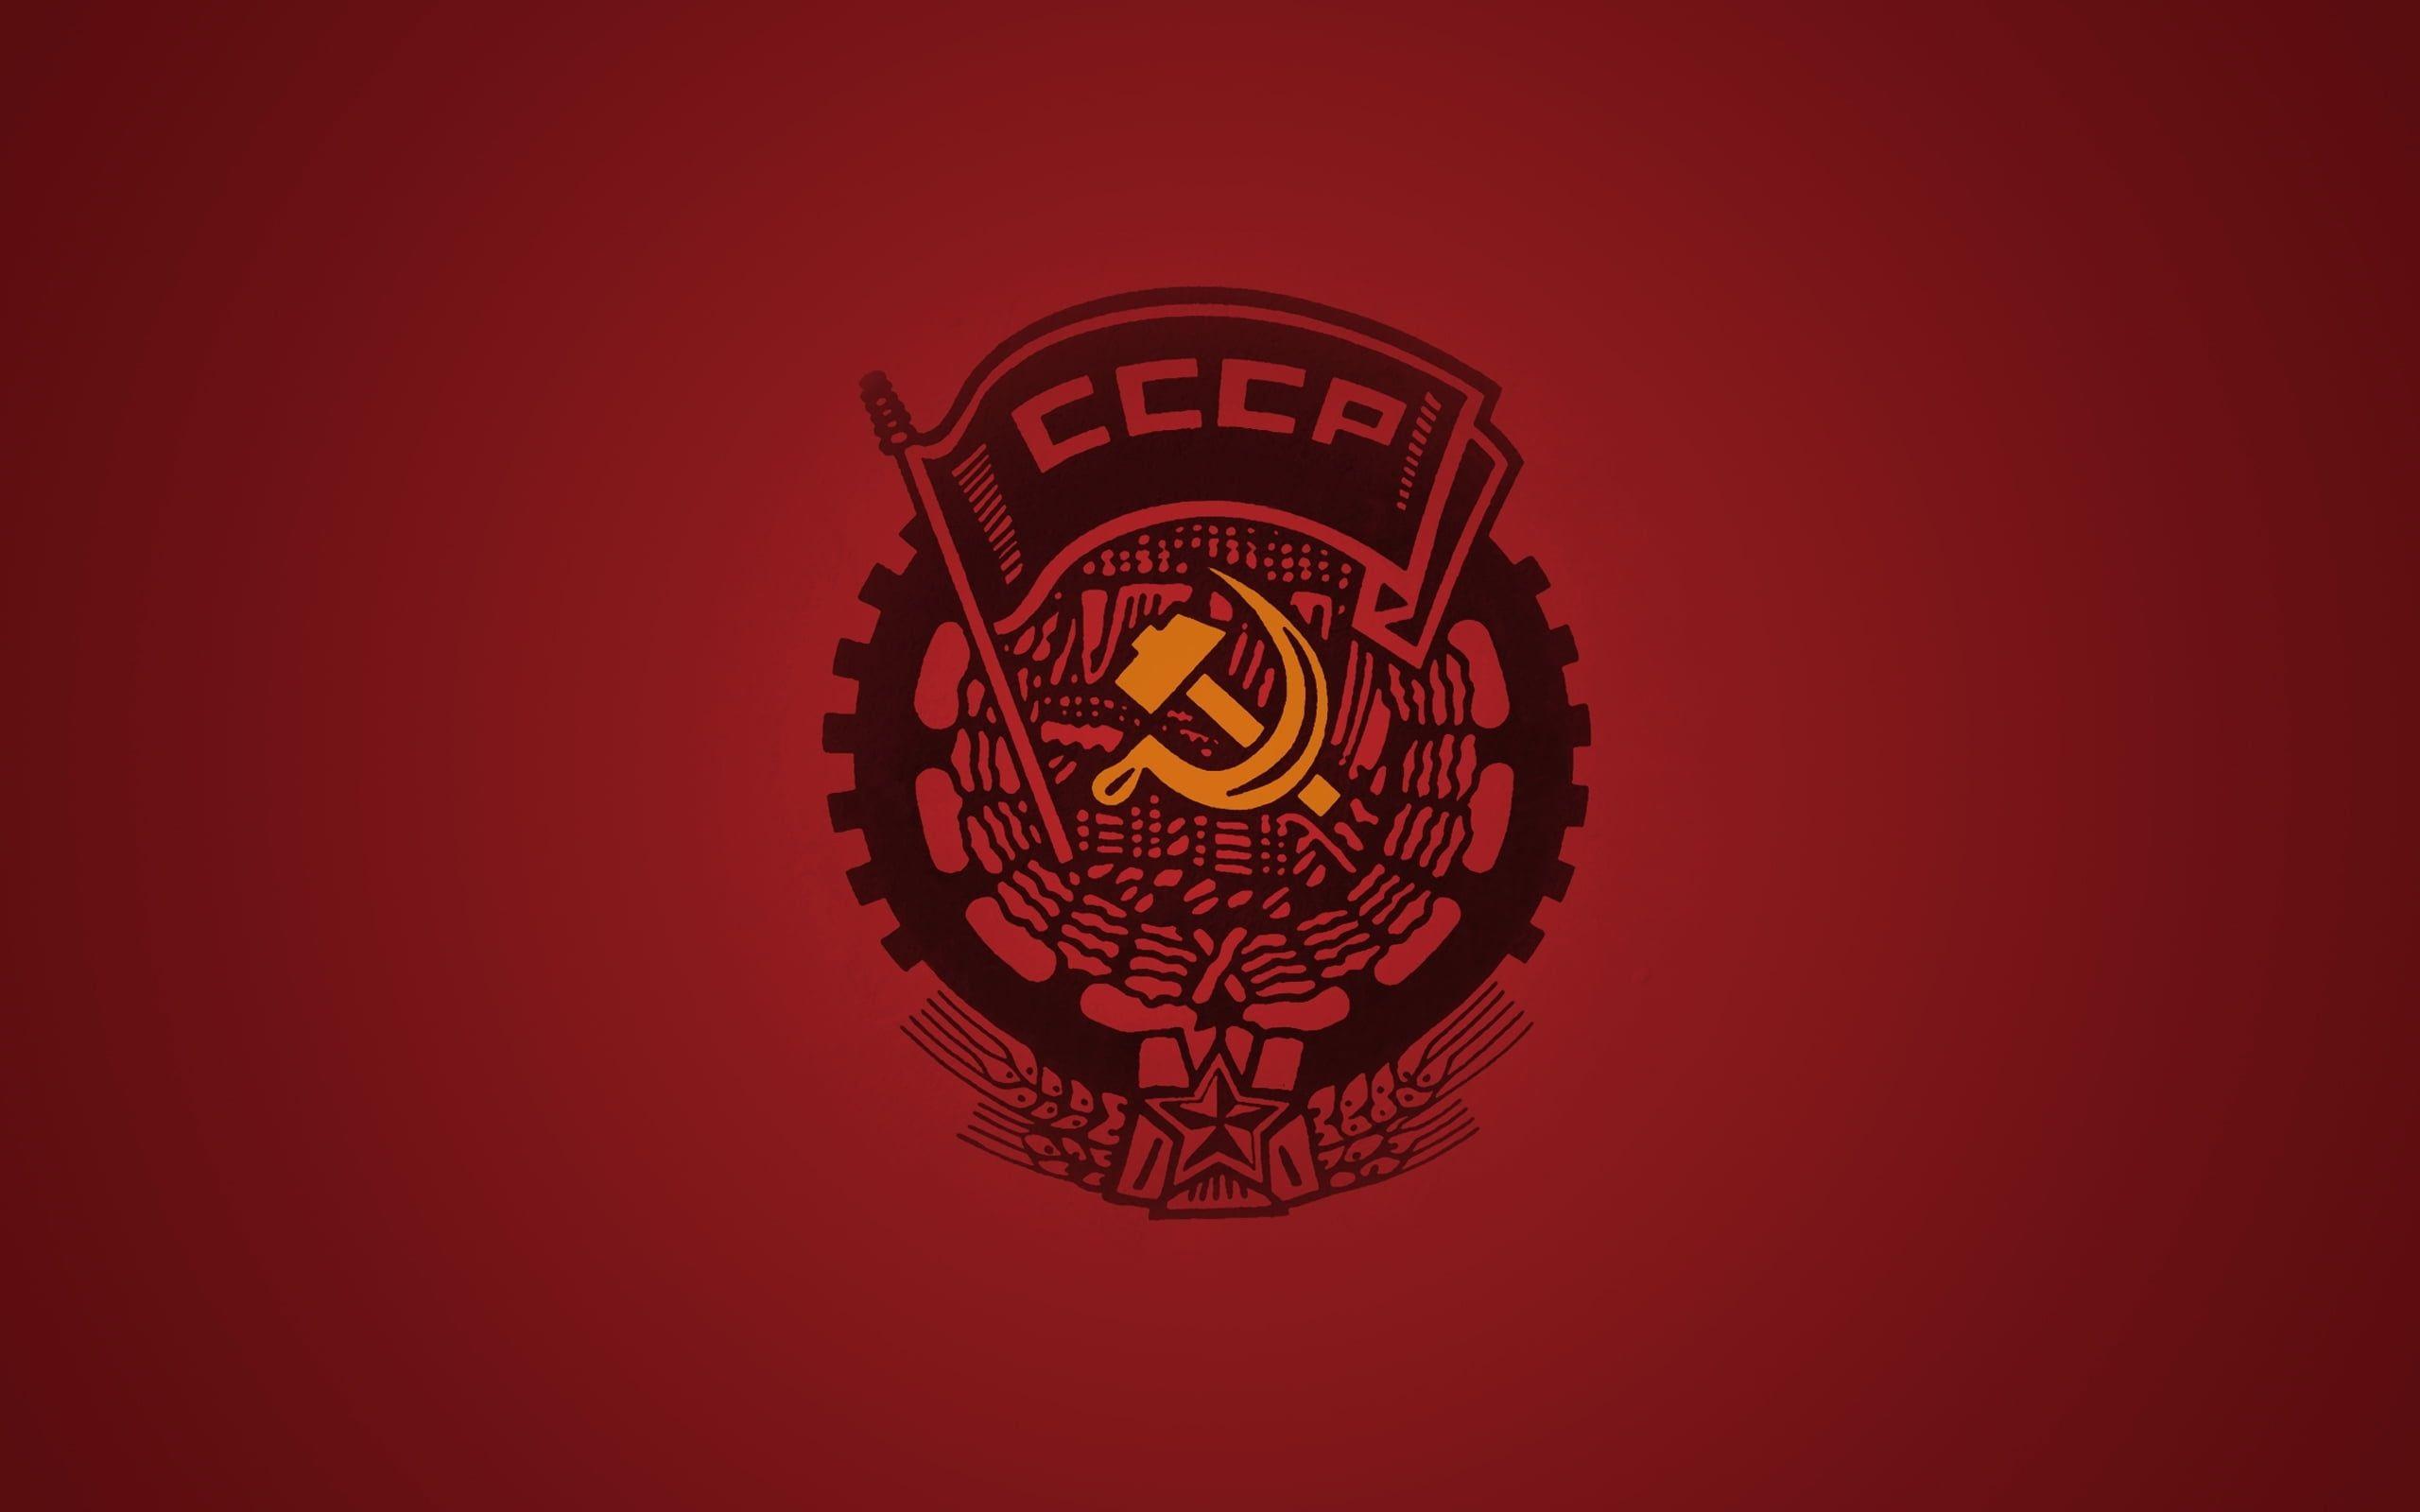 Red Background Ussr The Hammer And Sickle 2k Wallpaper Hdwallpaper Desktop In 2020 Soviet Art Hd Wallpaper Red Artwork